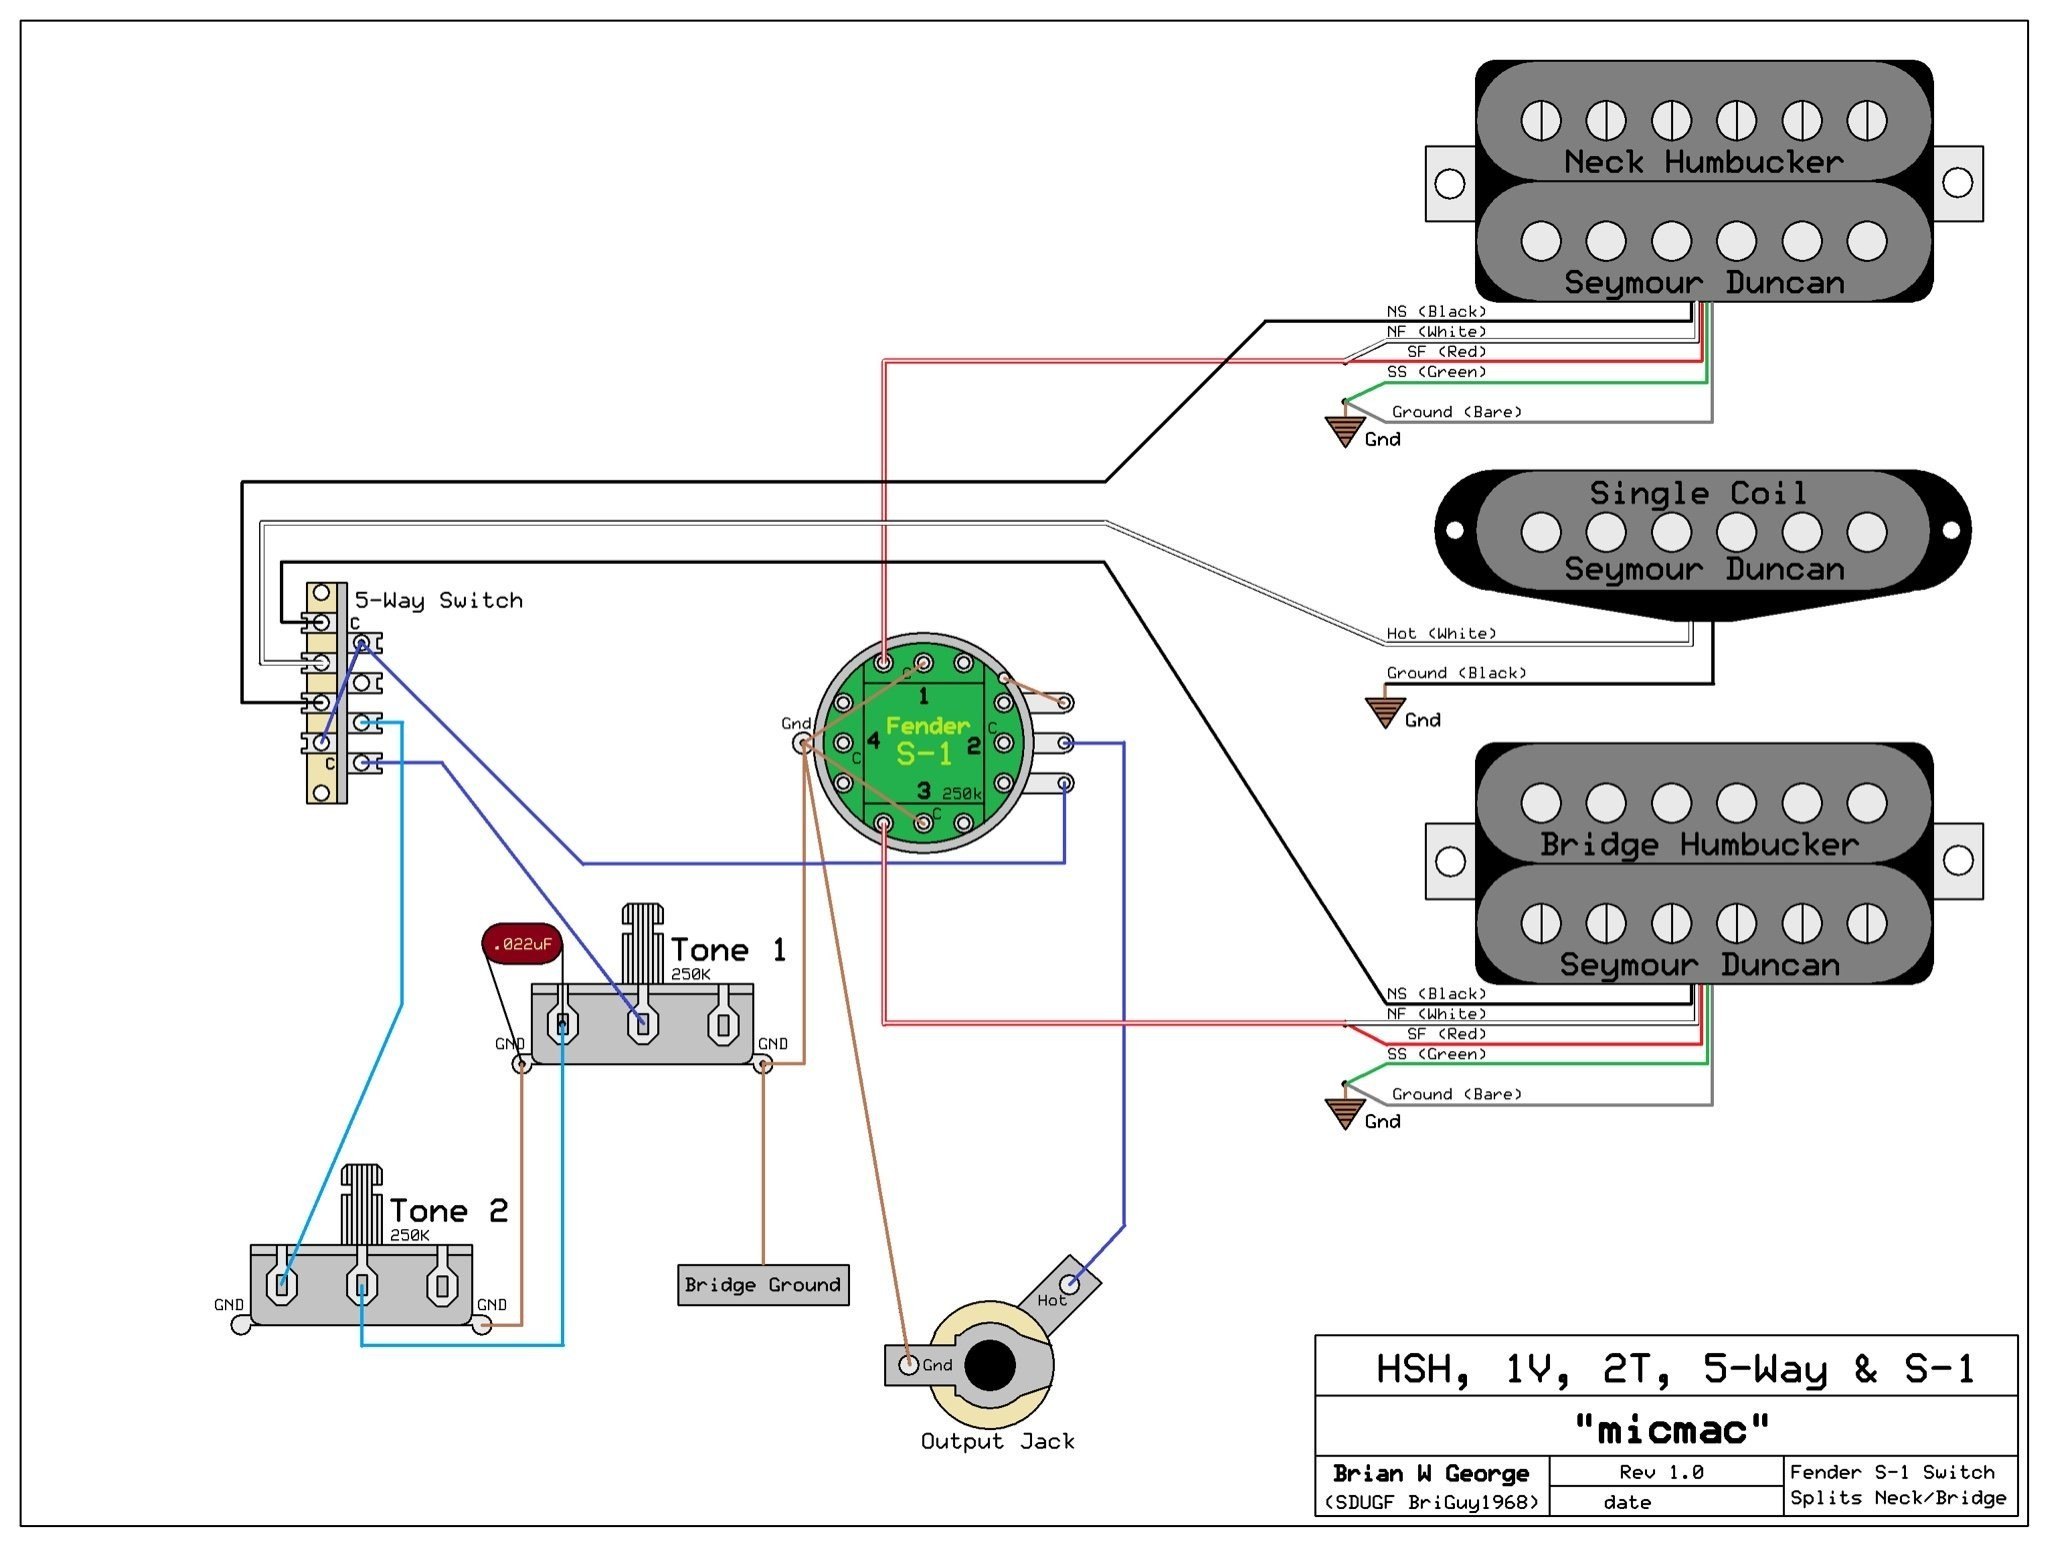 Fender S-1 Switching System Wiring Diagram Lk 6405] Fender Lace Sensor Wiring Wiring Diagram Of Fender S-1 Switching System Wiring Diagram